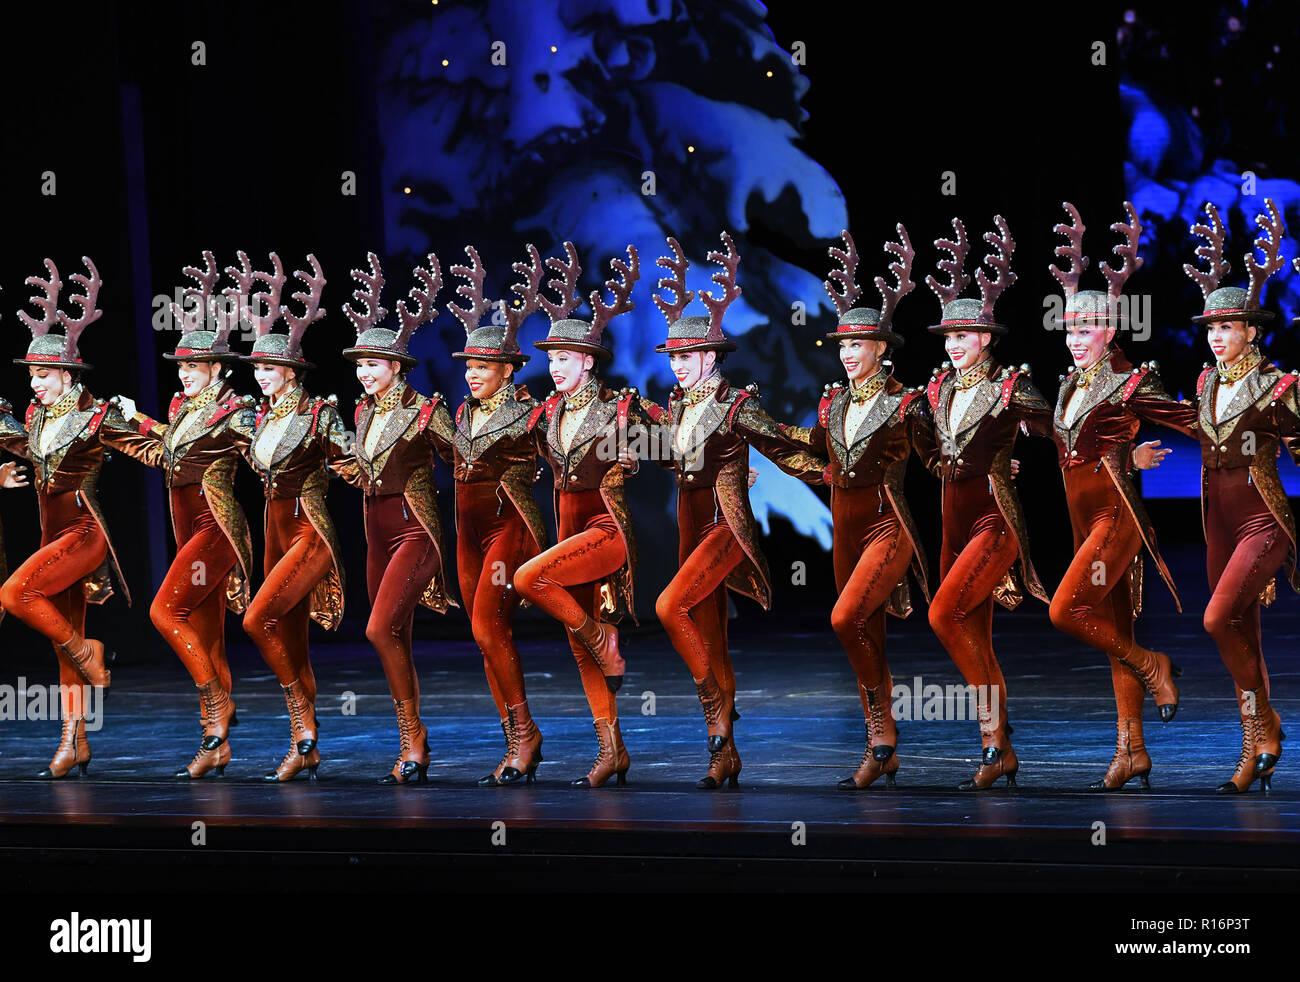 Rockettes Stockfotos & Rockettes Bilder - Alamy